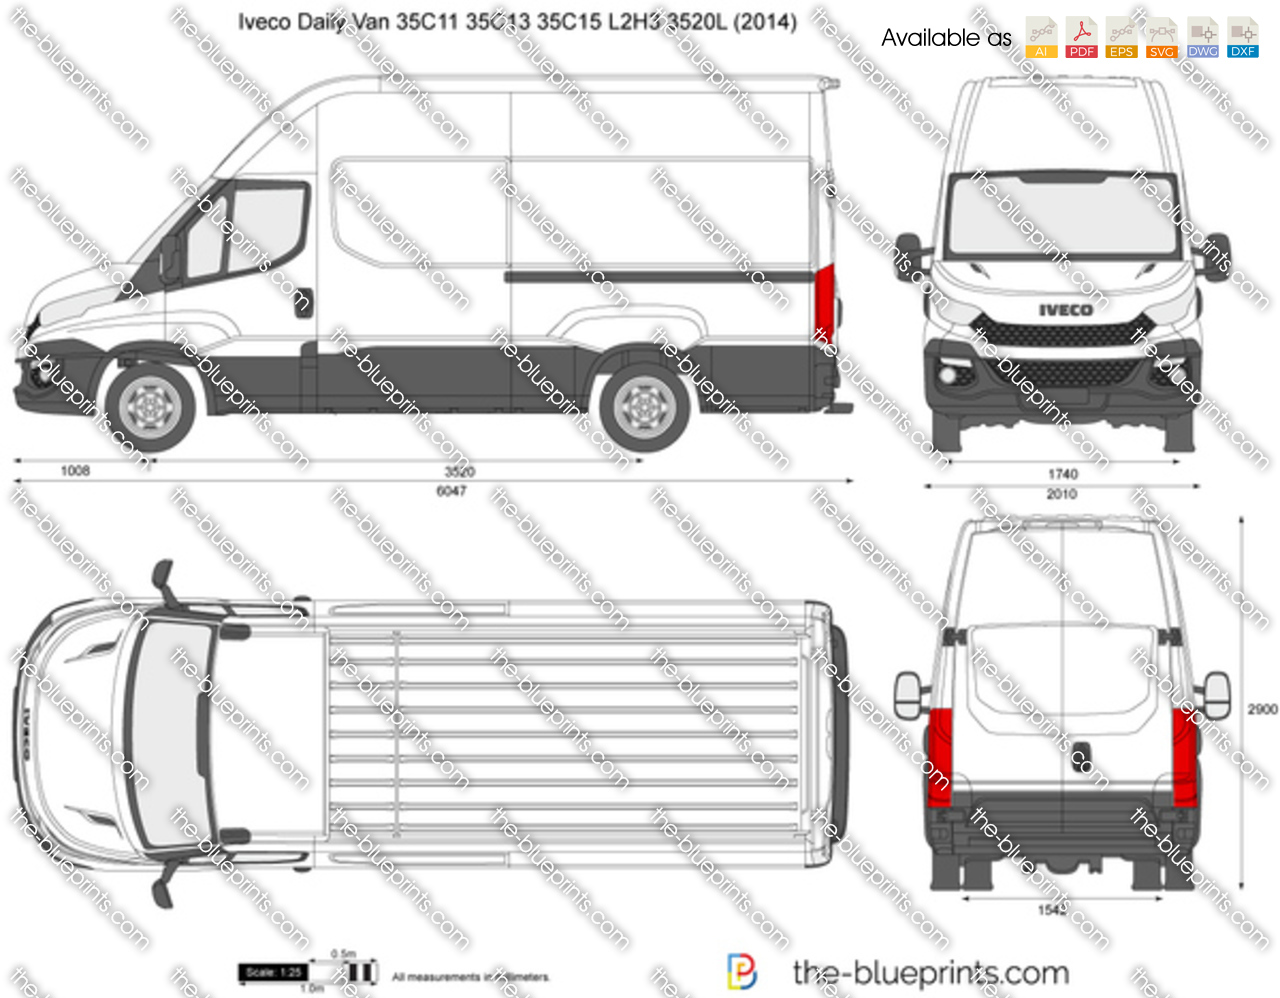 Iveco Daily Van 35C11 35C13 35C15 L2H3 3520L